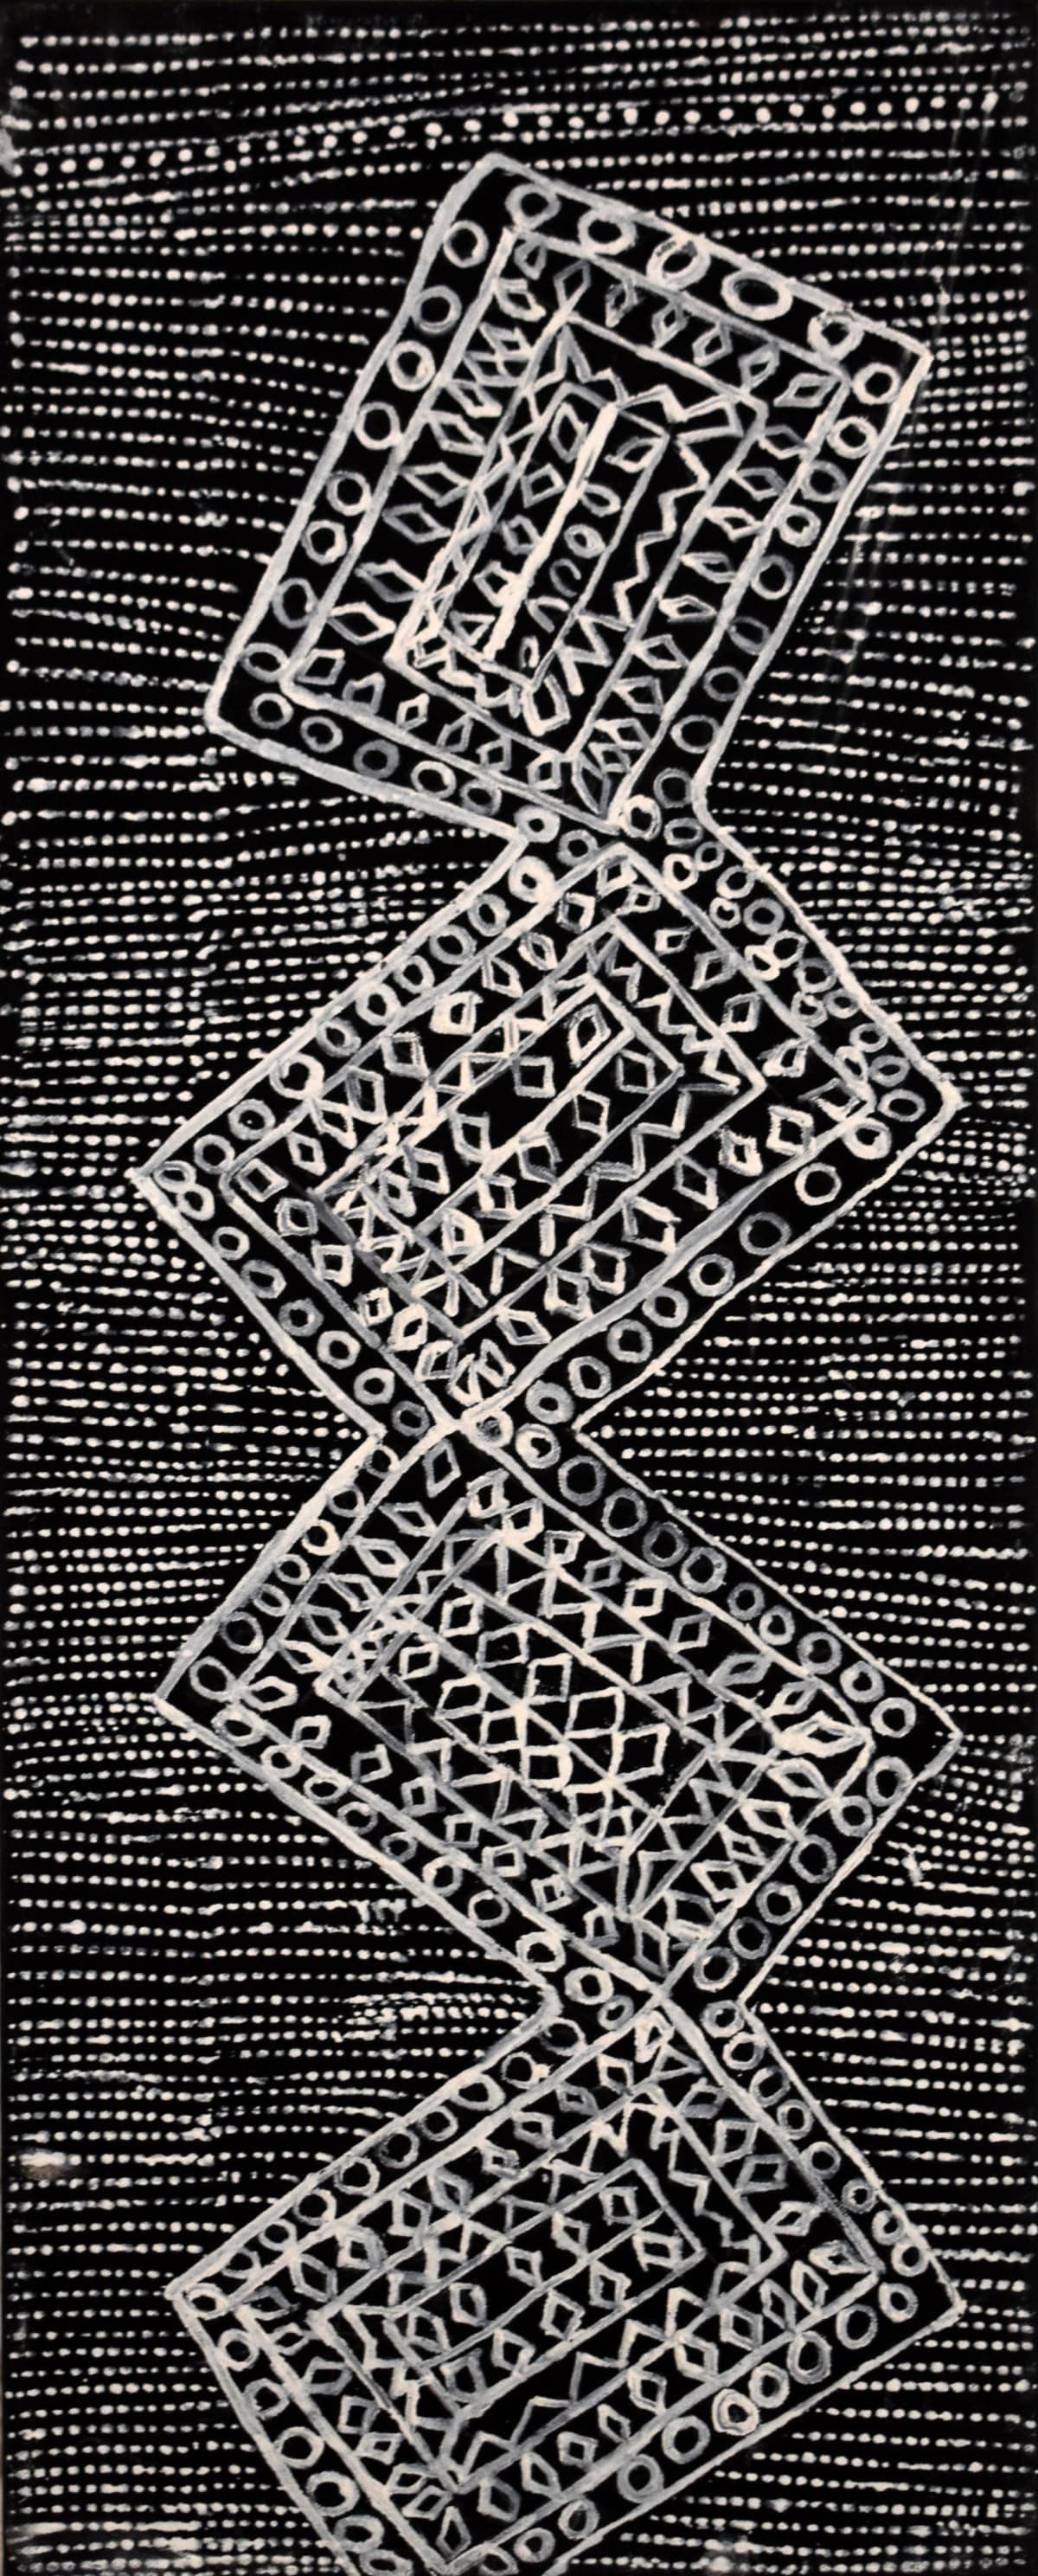 Rachel Puruntatameri JIlamara natural ochres on canvas 80 x 30 cm